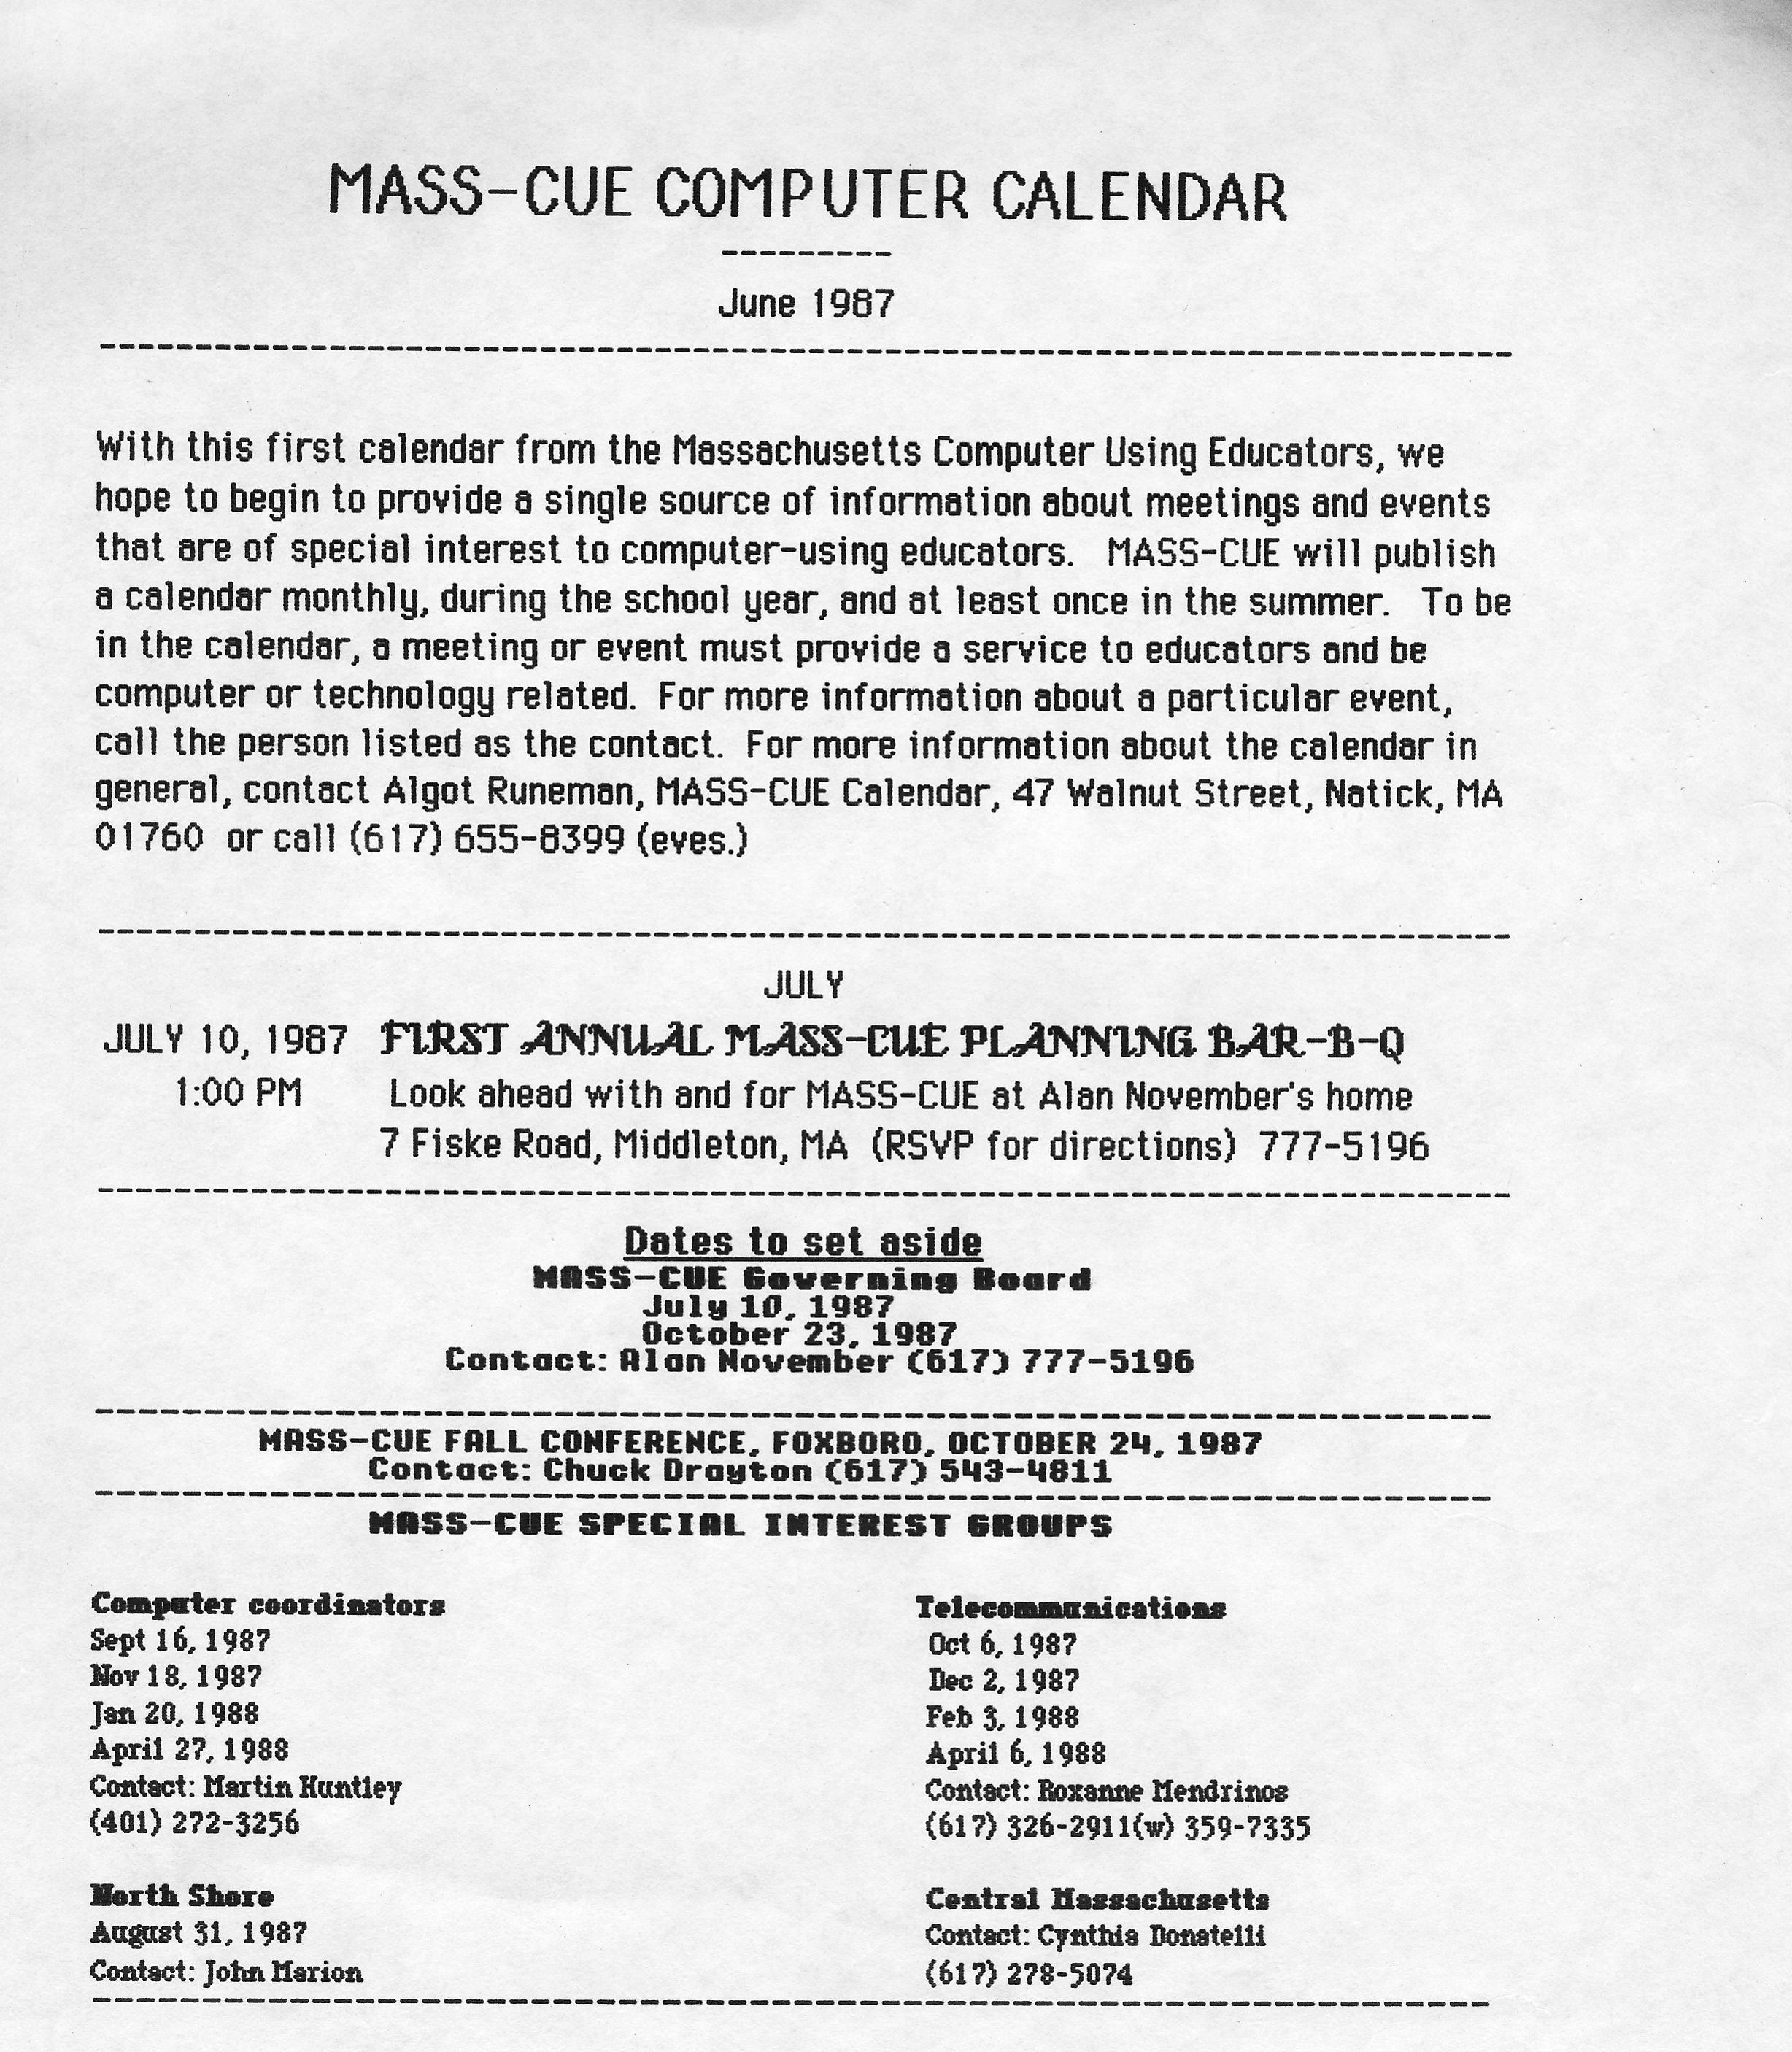 Masscue Archives 1987